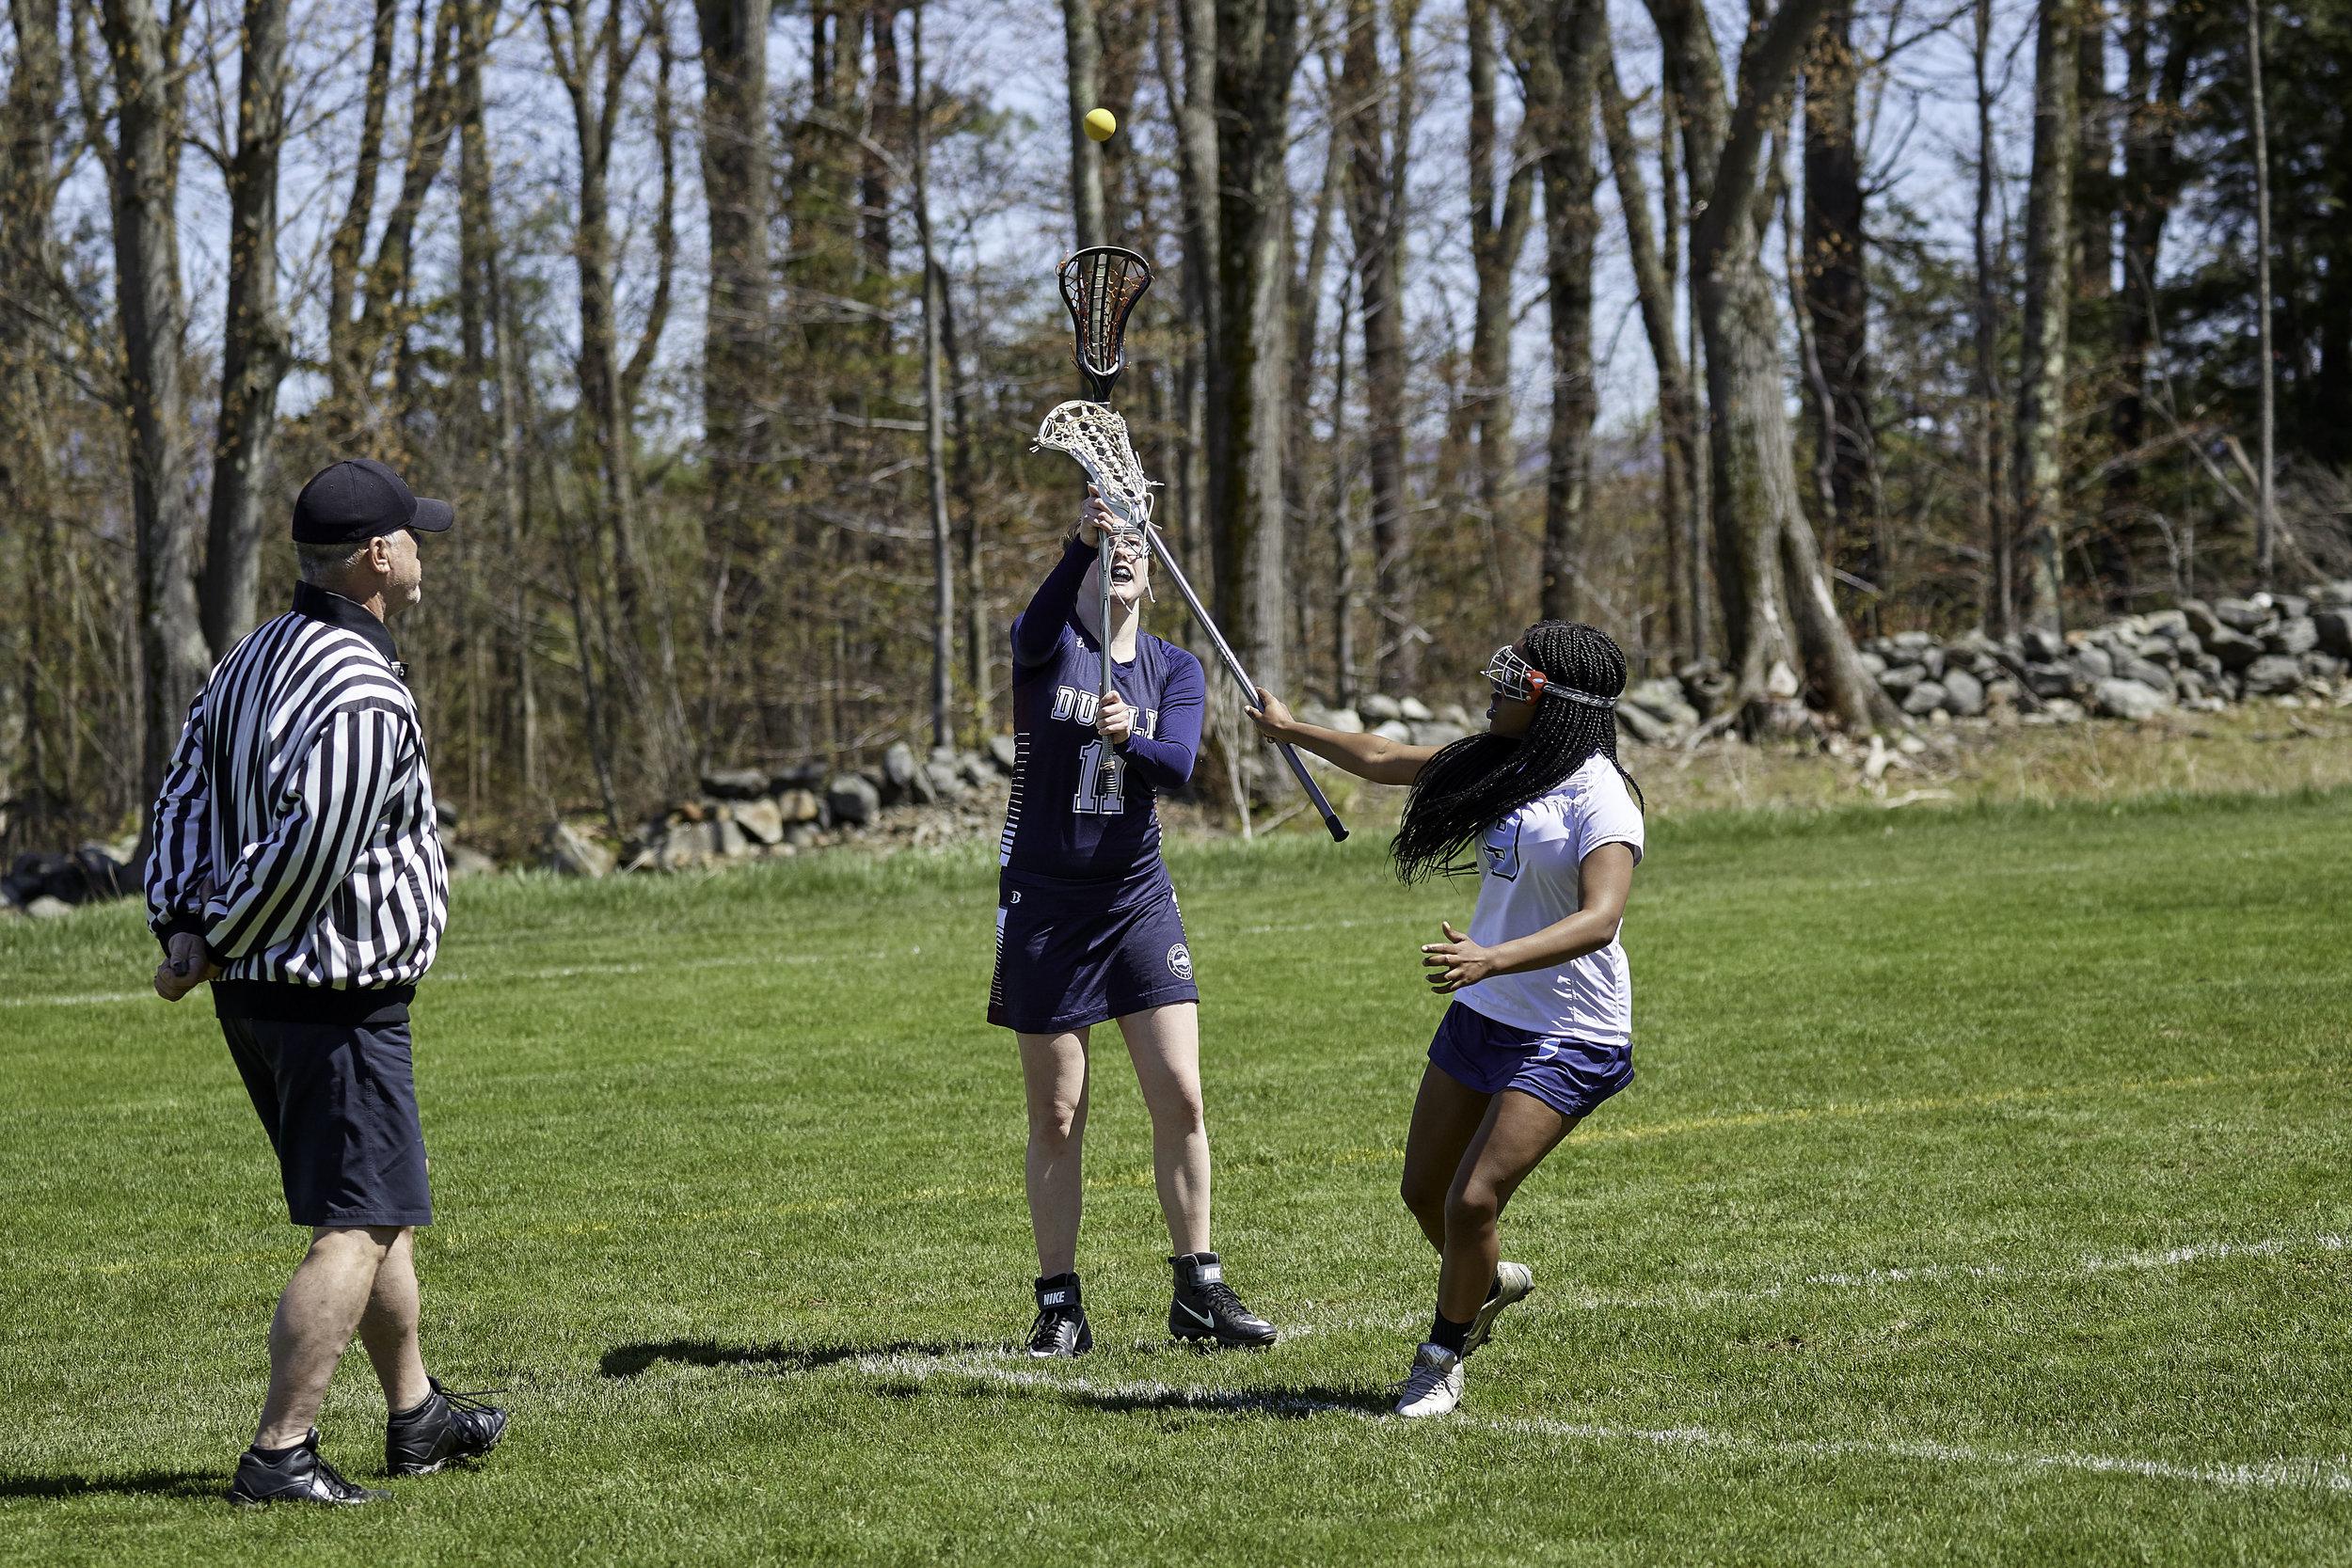 Girls Lacrosse vs. Stoneleigh Burnham School - May 11, 2019 - May 10, 2019193208.jpg